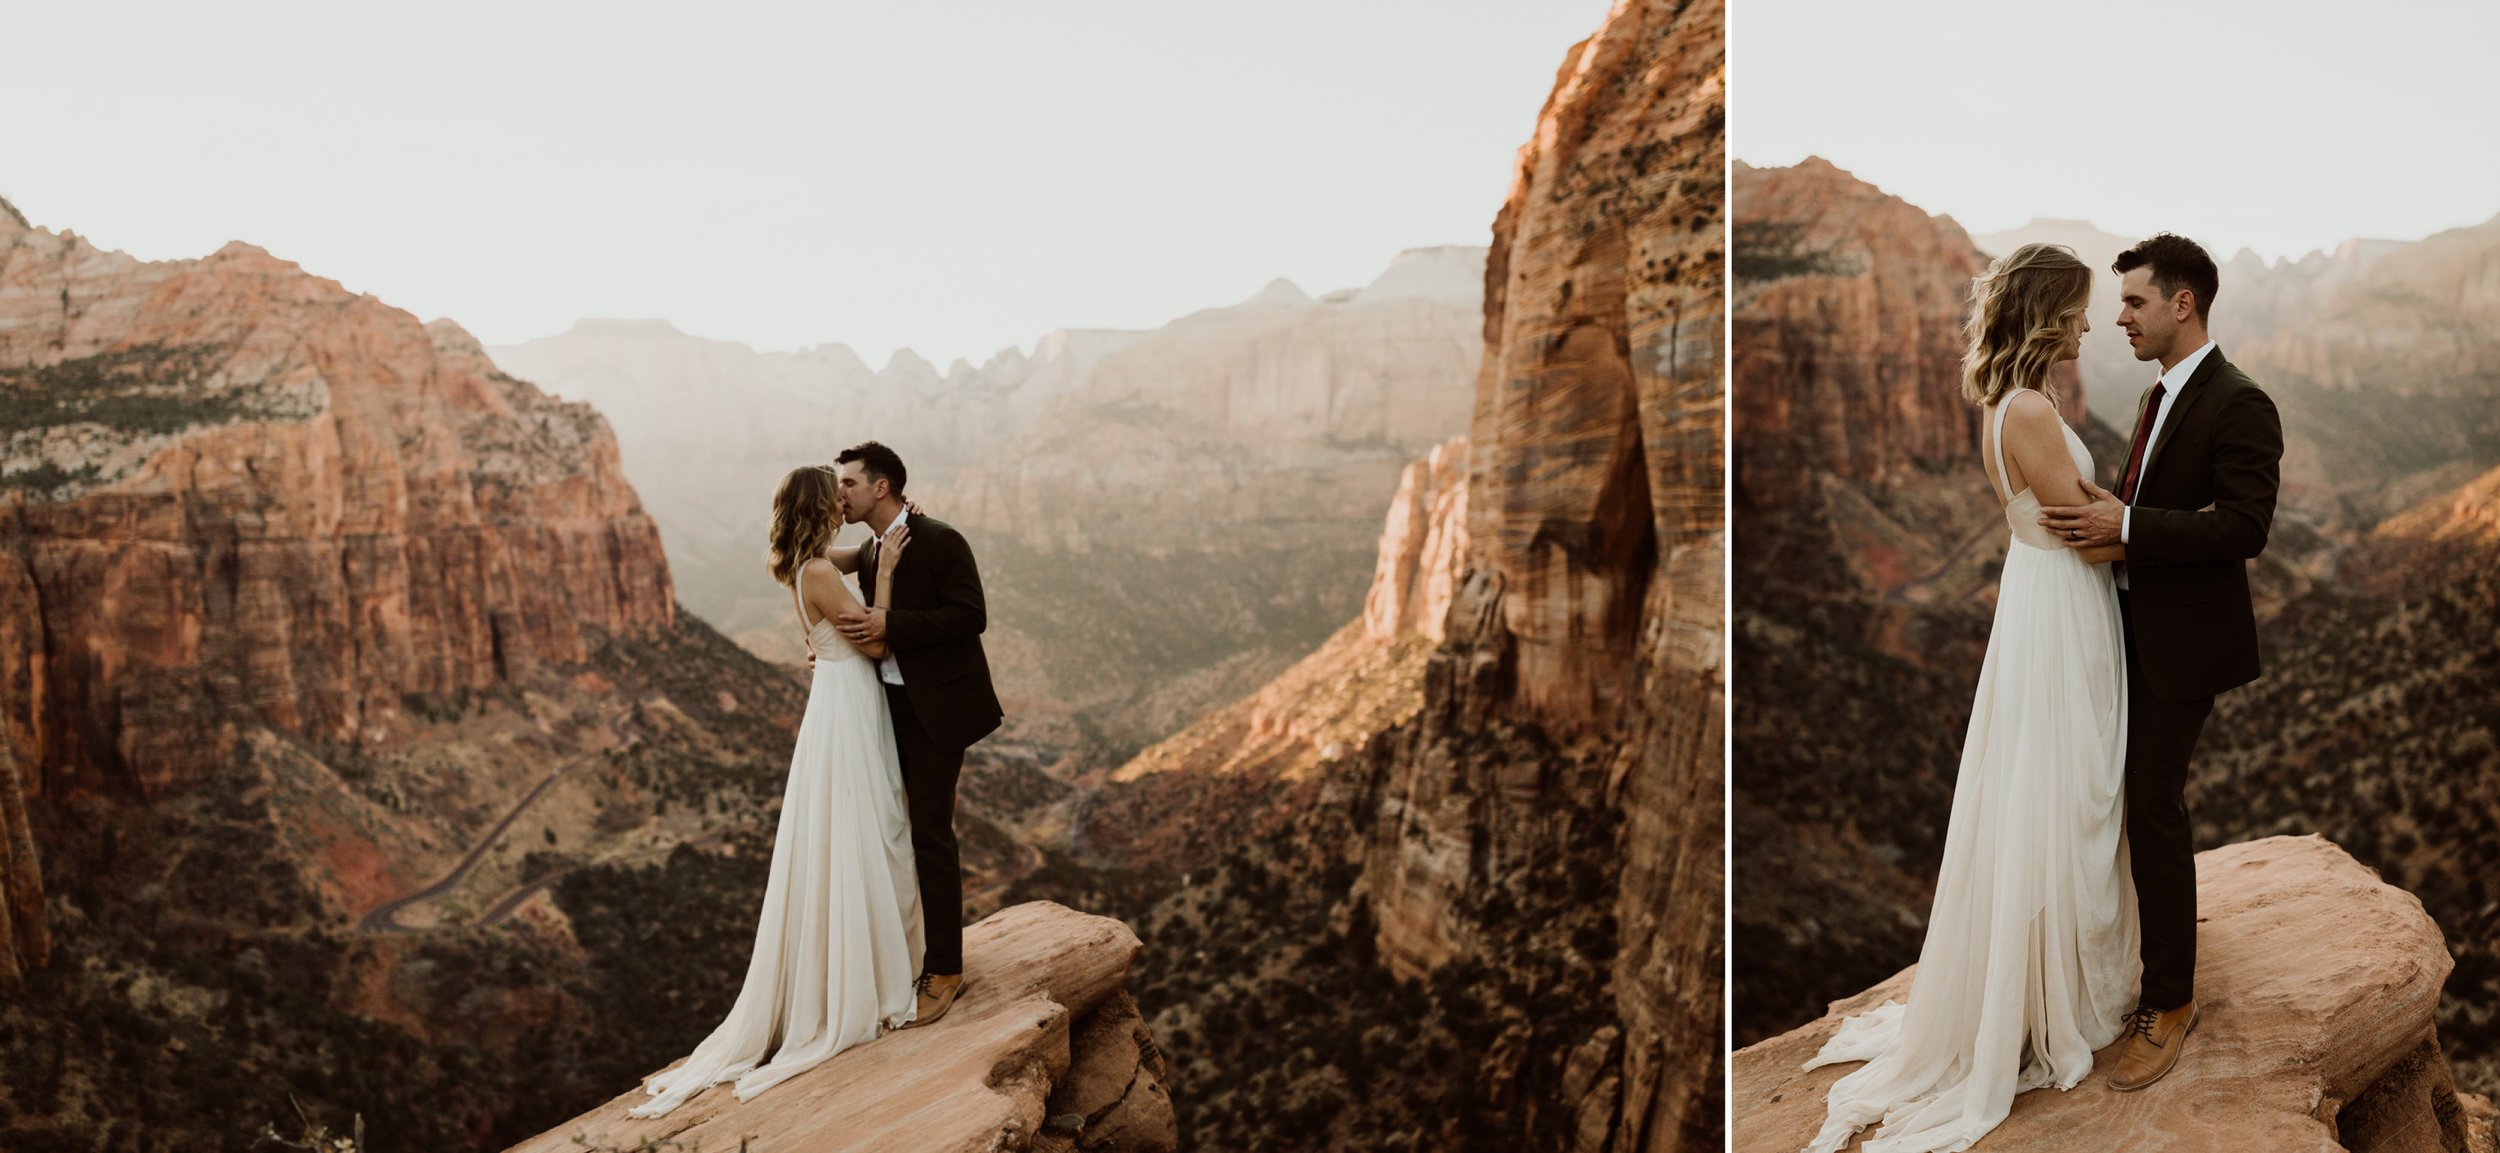 zion-national-park-wedding-169.jpg